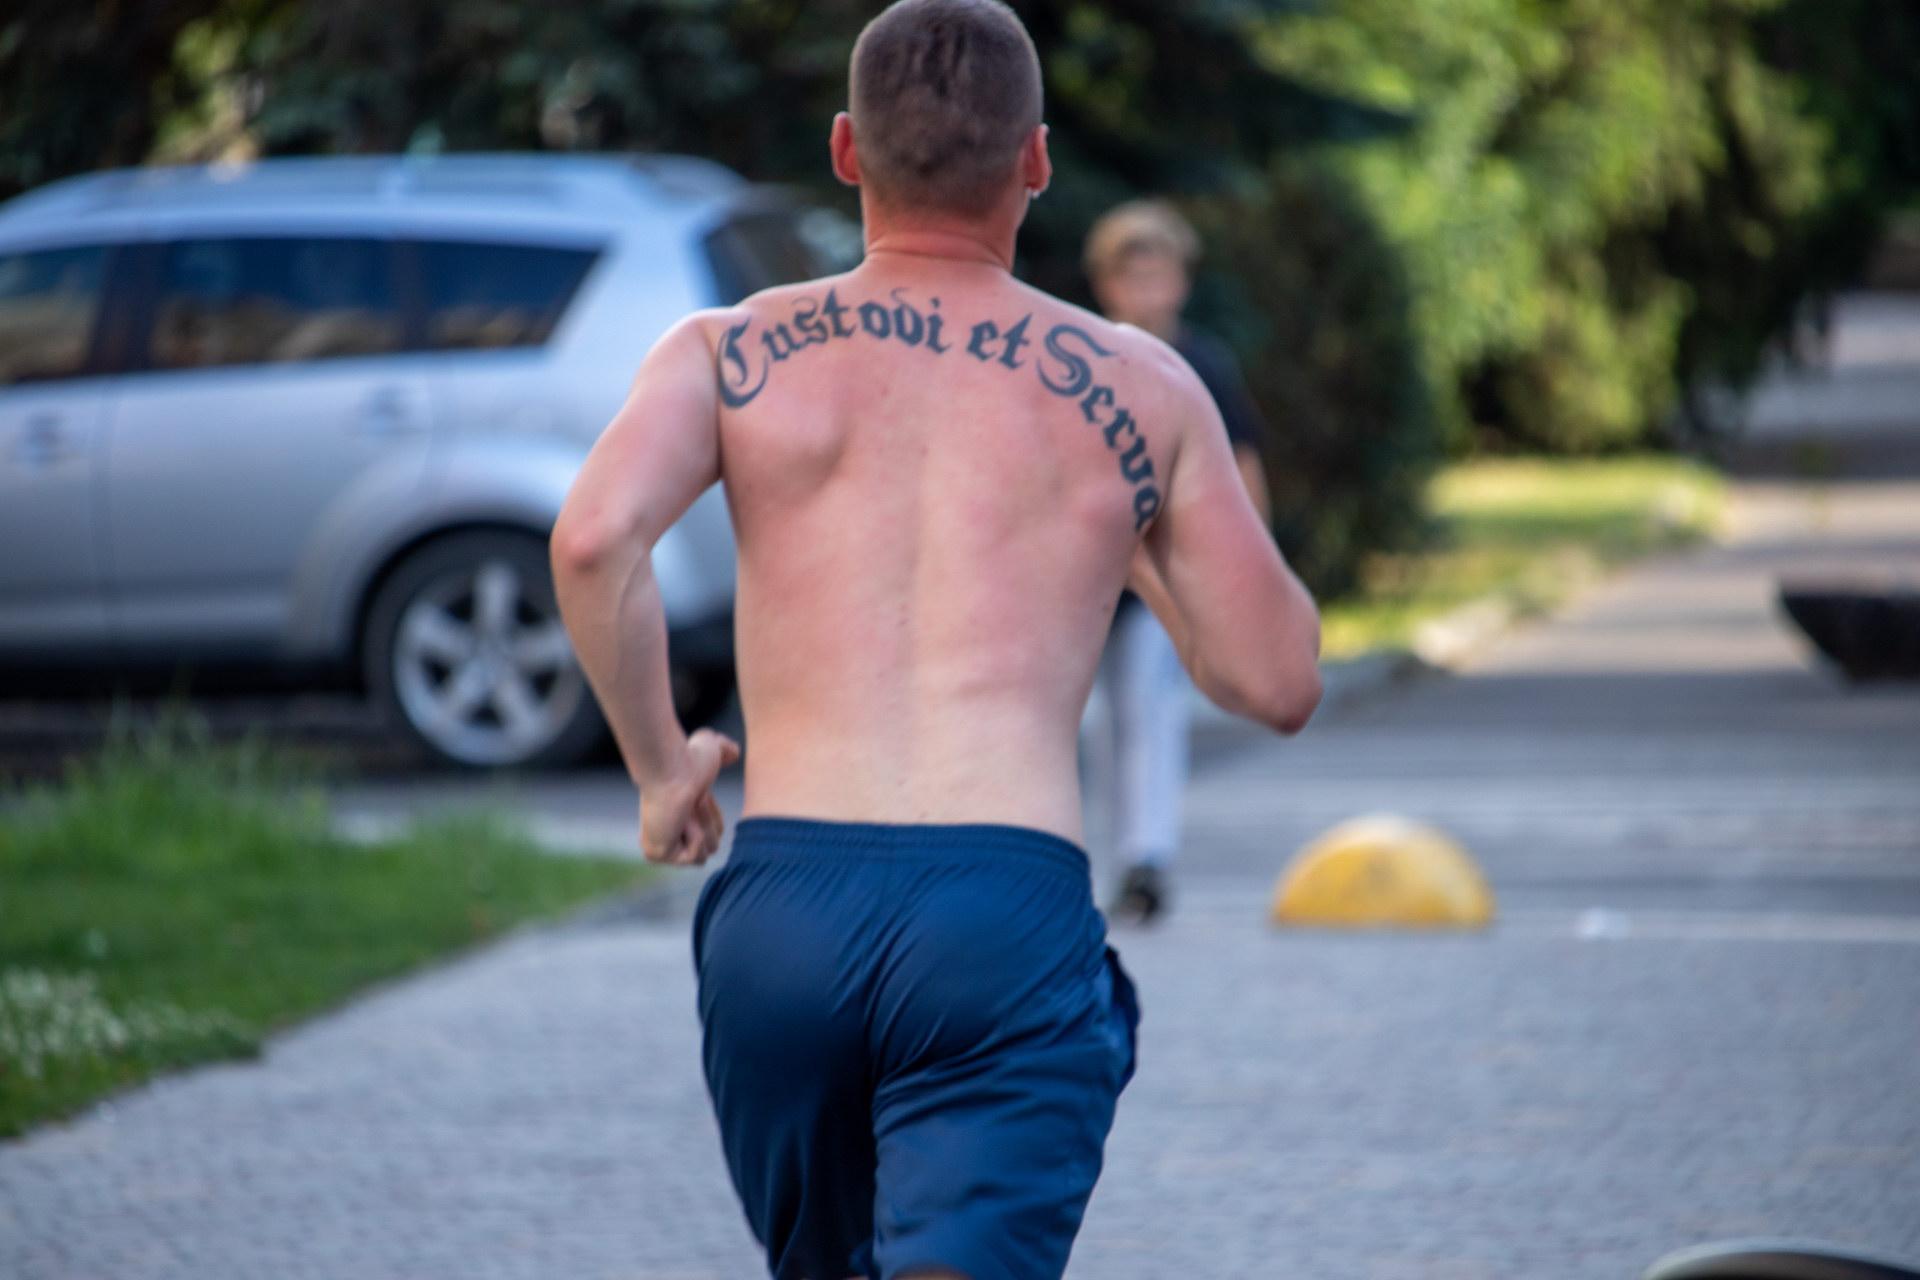 Тату надпись на спине парня Custodi et serva – спаси и сохрани на латыни - street tattoo № 07 – 24.06.2020 – tatufoto.com 1